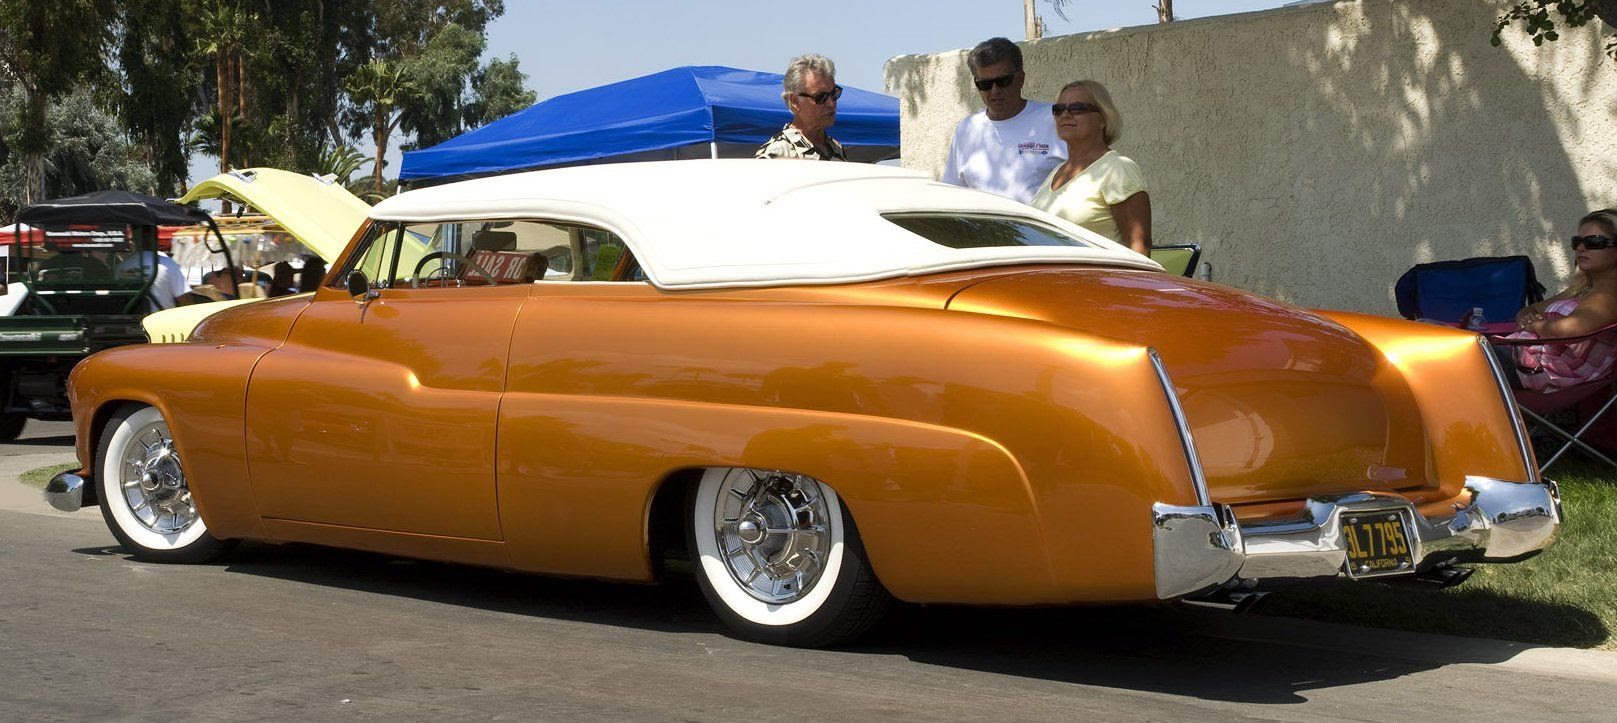 Mercury Lead Sled Convertible | Used Daewoo Cars